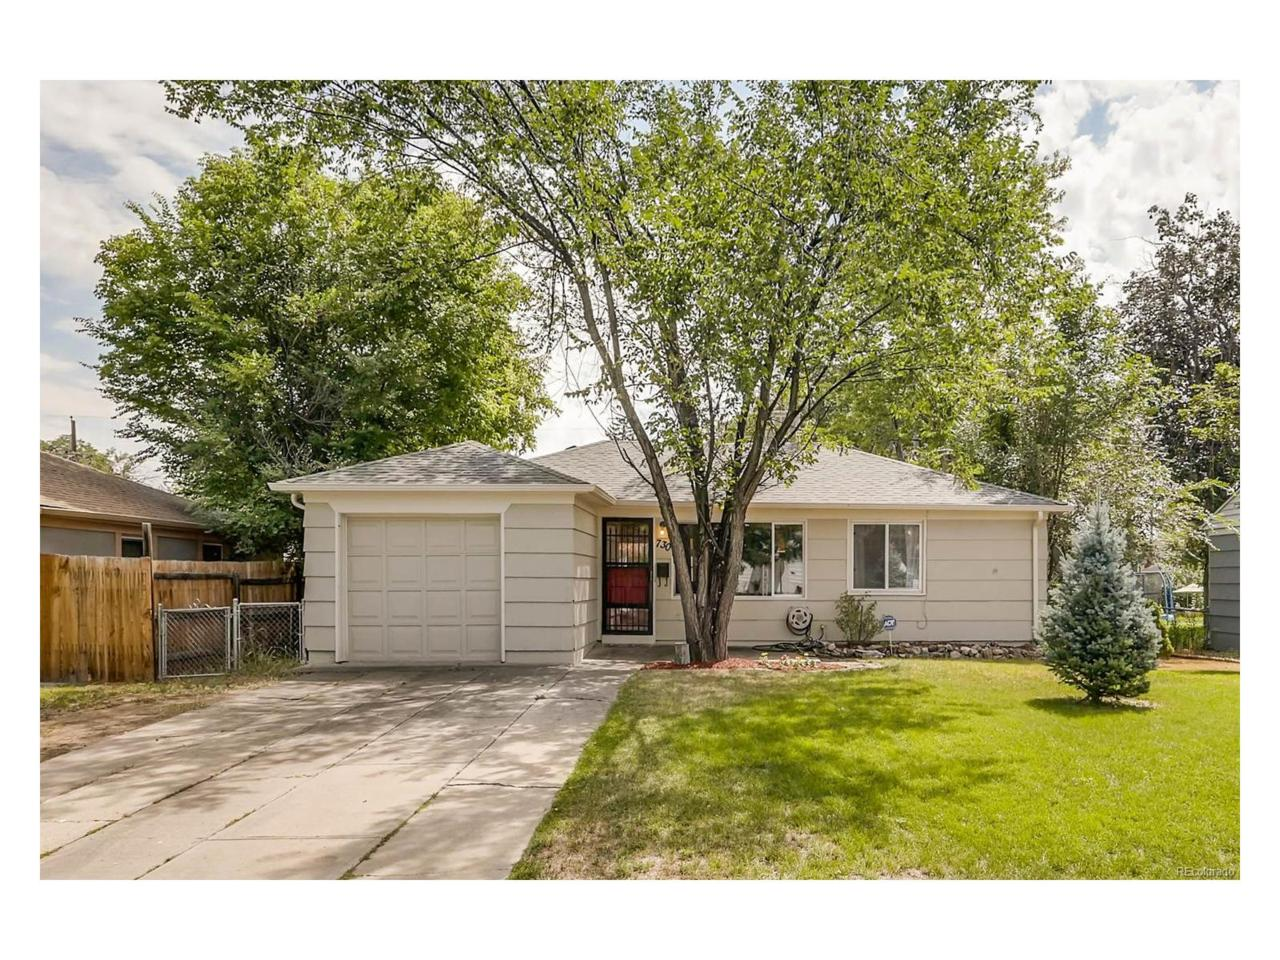 730 Hanover Street, Aurora, CO 80010 (MLS #1690836) :: 8z Real Estate